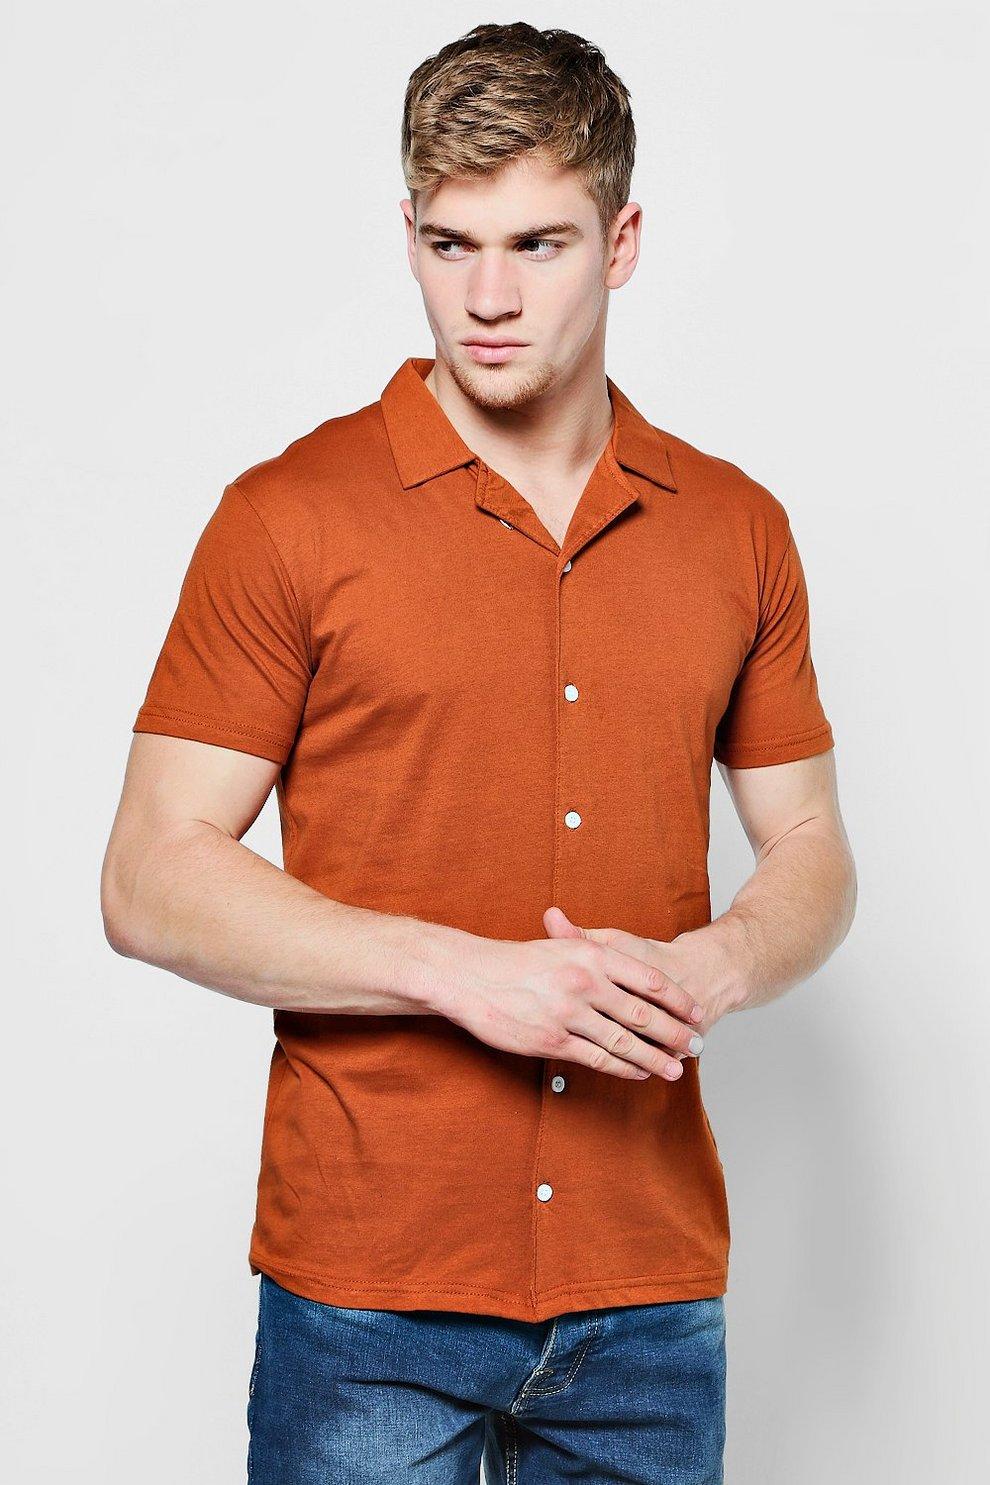 3c89cc73ee21a5 Jersey Revere Collar Short Sleeve Shirt - boohooMAN